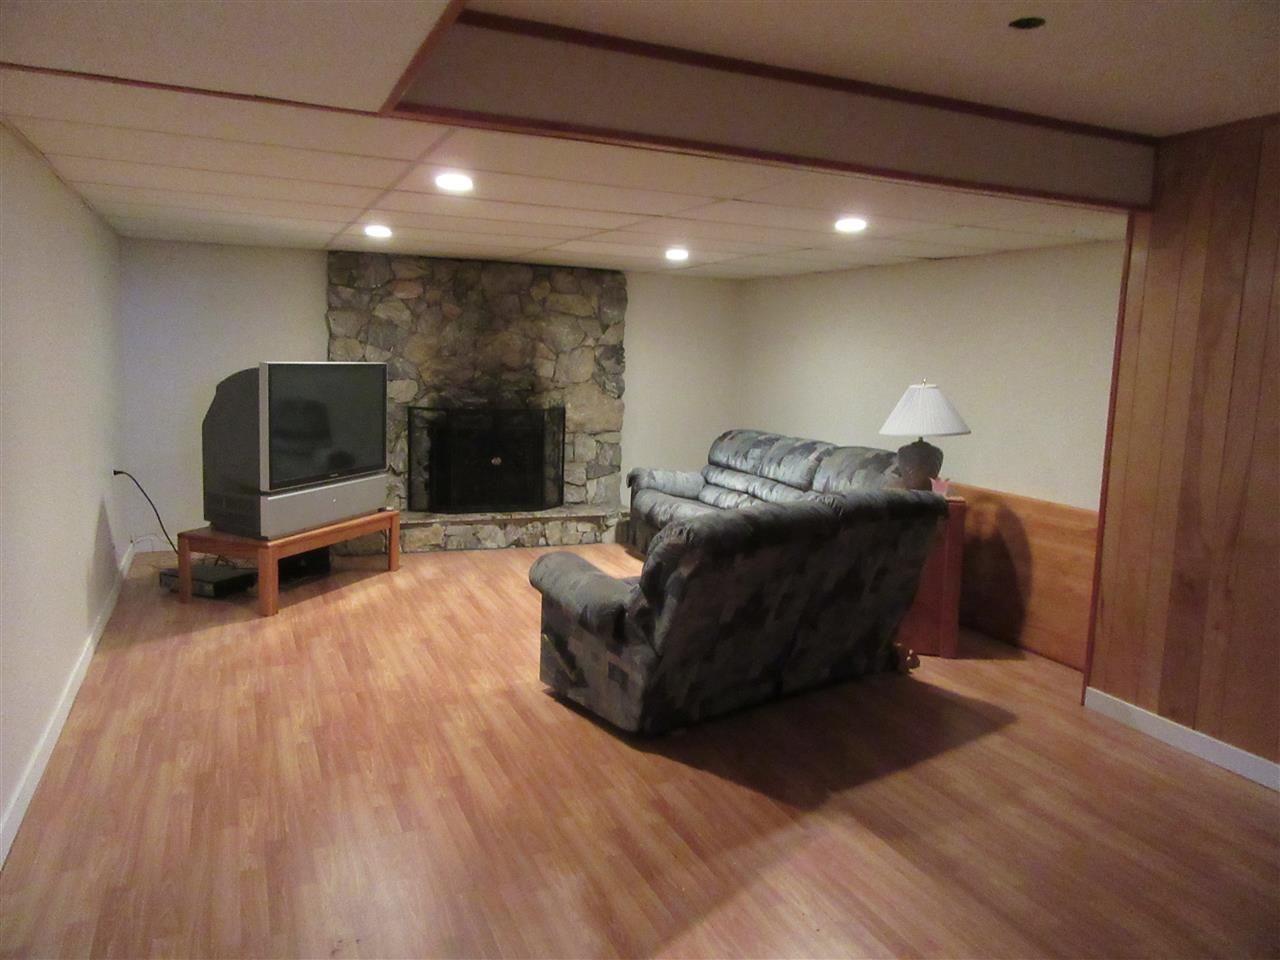 Photo 15: Photos: 522 RADCLIFFE Drive: Quinson House for sale (PG City West (Zone 71))  : MLS®# R2433646